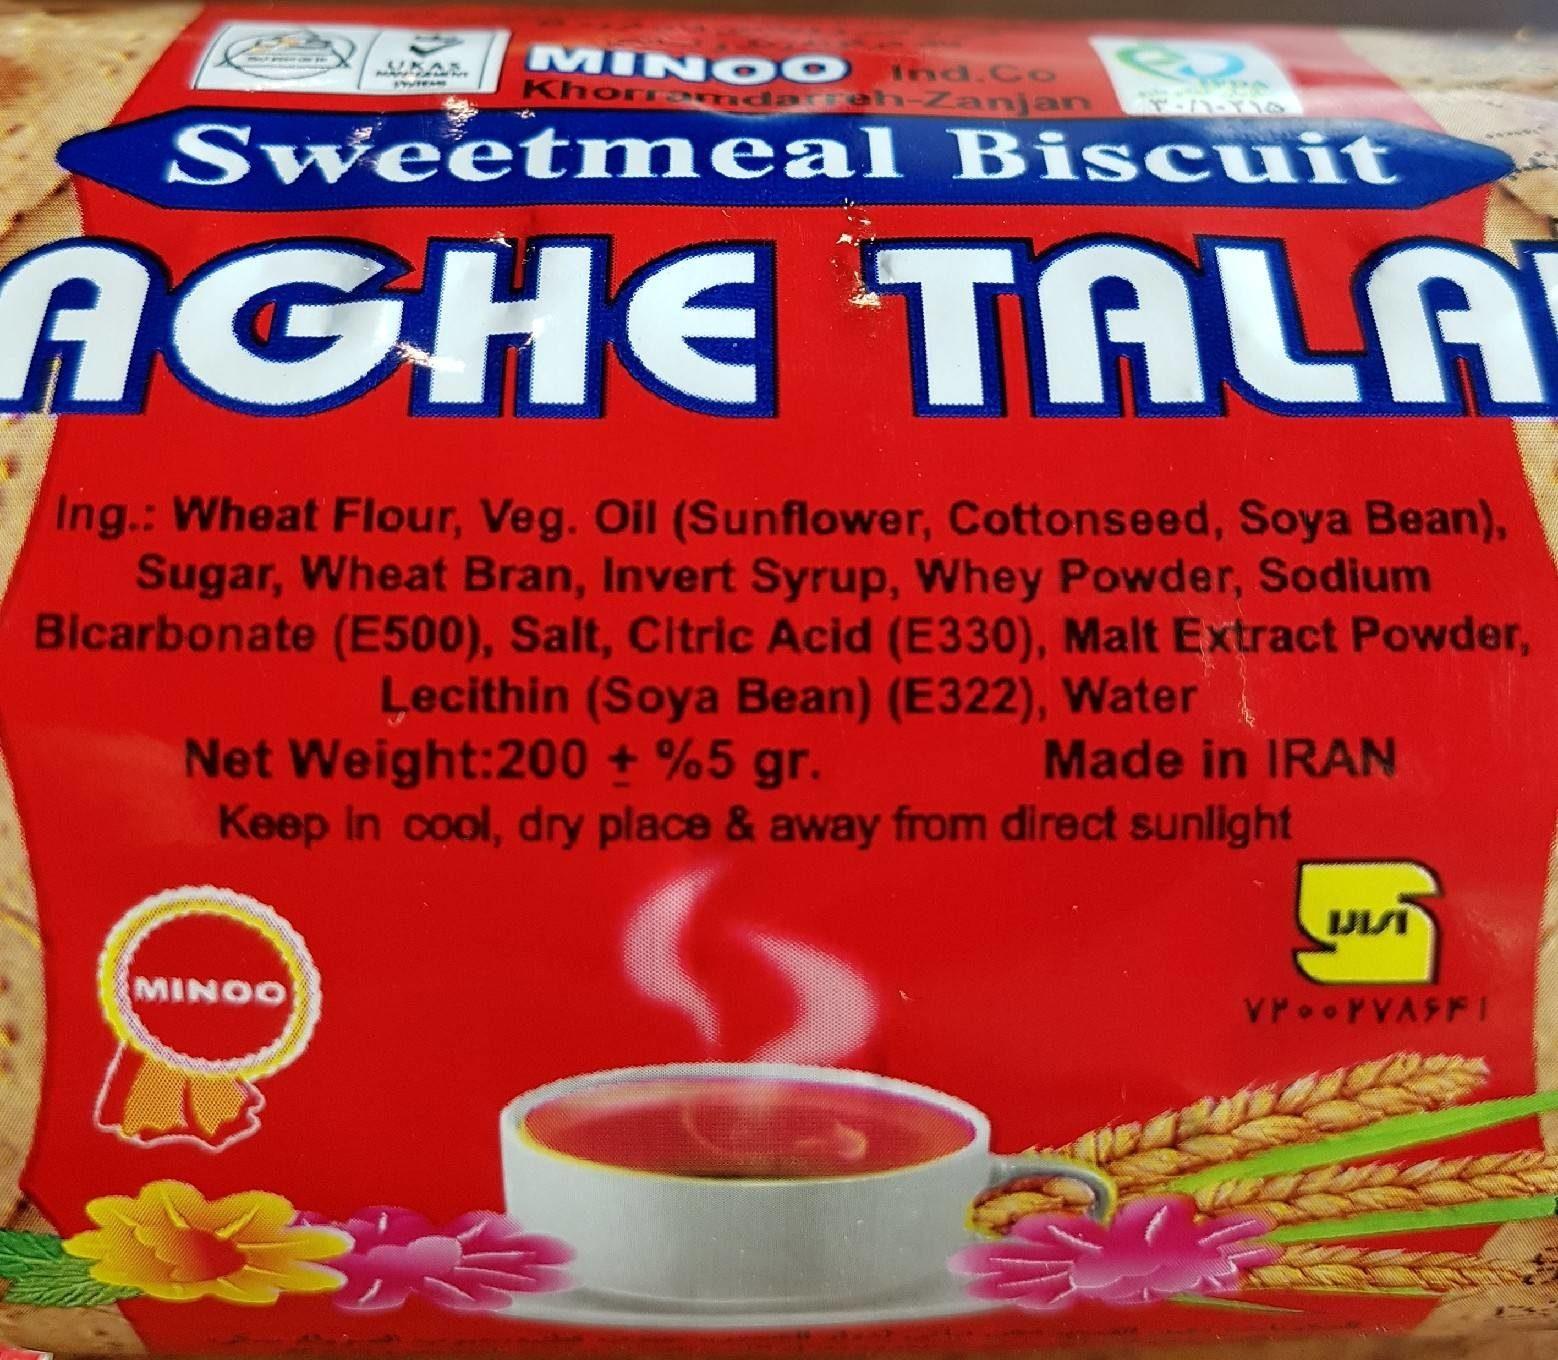 Wholegrain Biscuits Saghe Talaee Mino 200 G - Valori nutrizionali - en